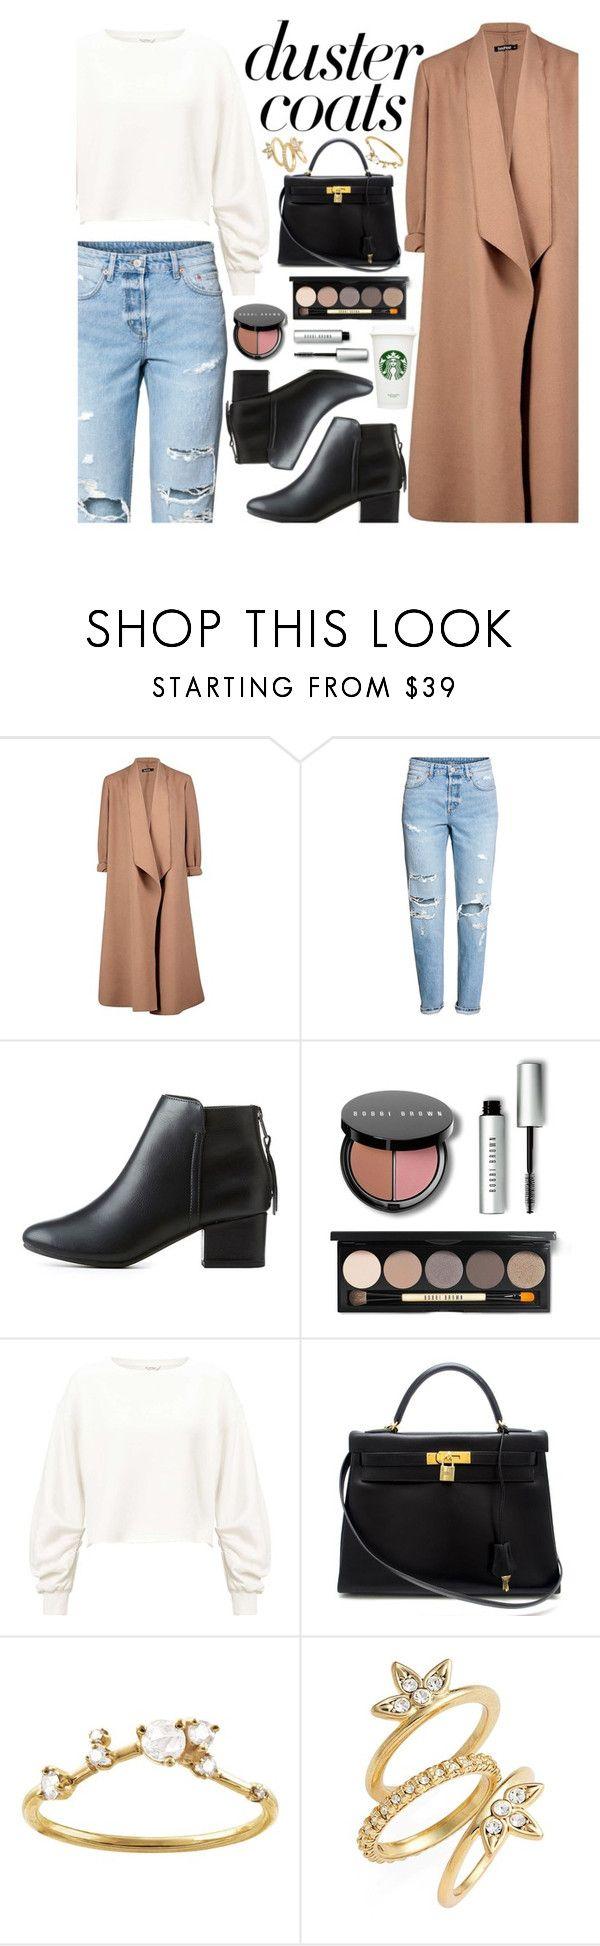 """Duster Coats"" by xxfashiongirl12xx ❤ liked on Polyvore featuring Boohoo, H&M, City Classified, Bobbi Brown Cosmetics, Miss Selfridge, Hermès, WWAKE, Luv Aj, starbucks and Sweatshirt"